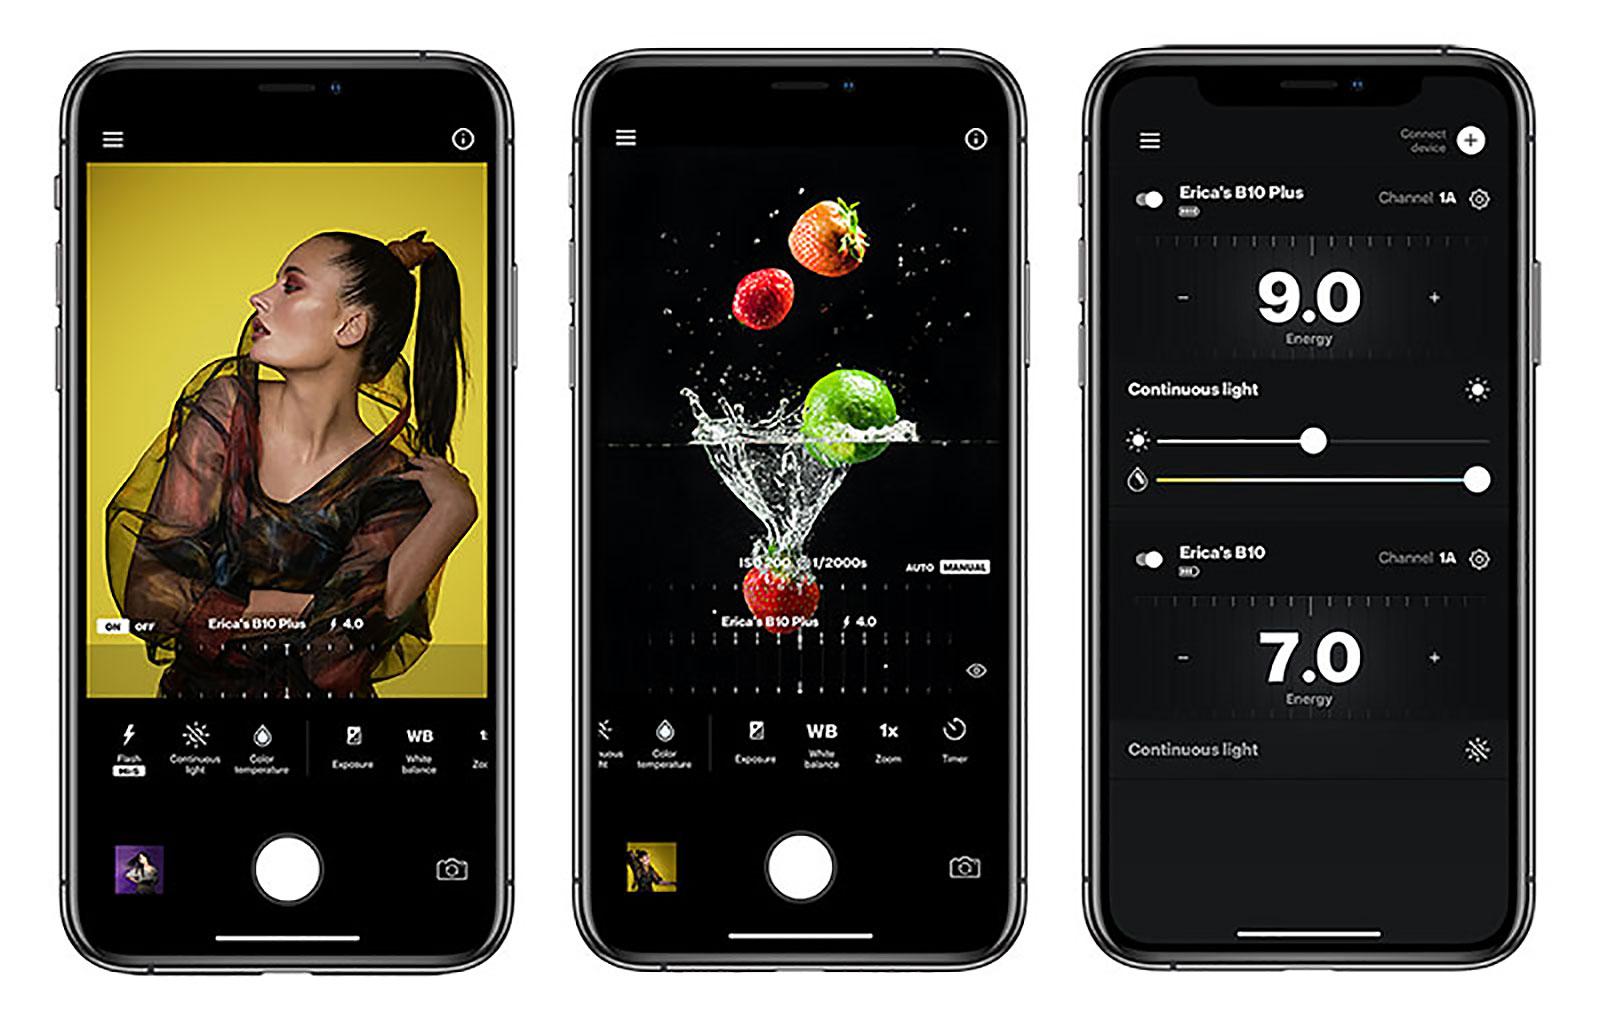 Profoto AirX Smartphone App